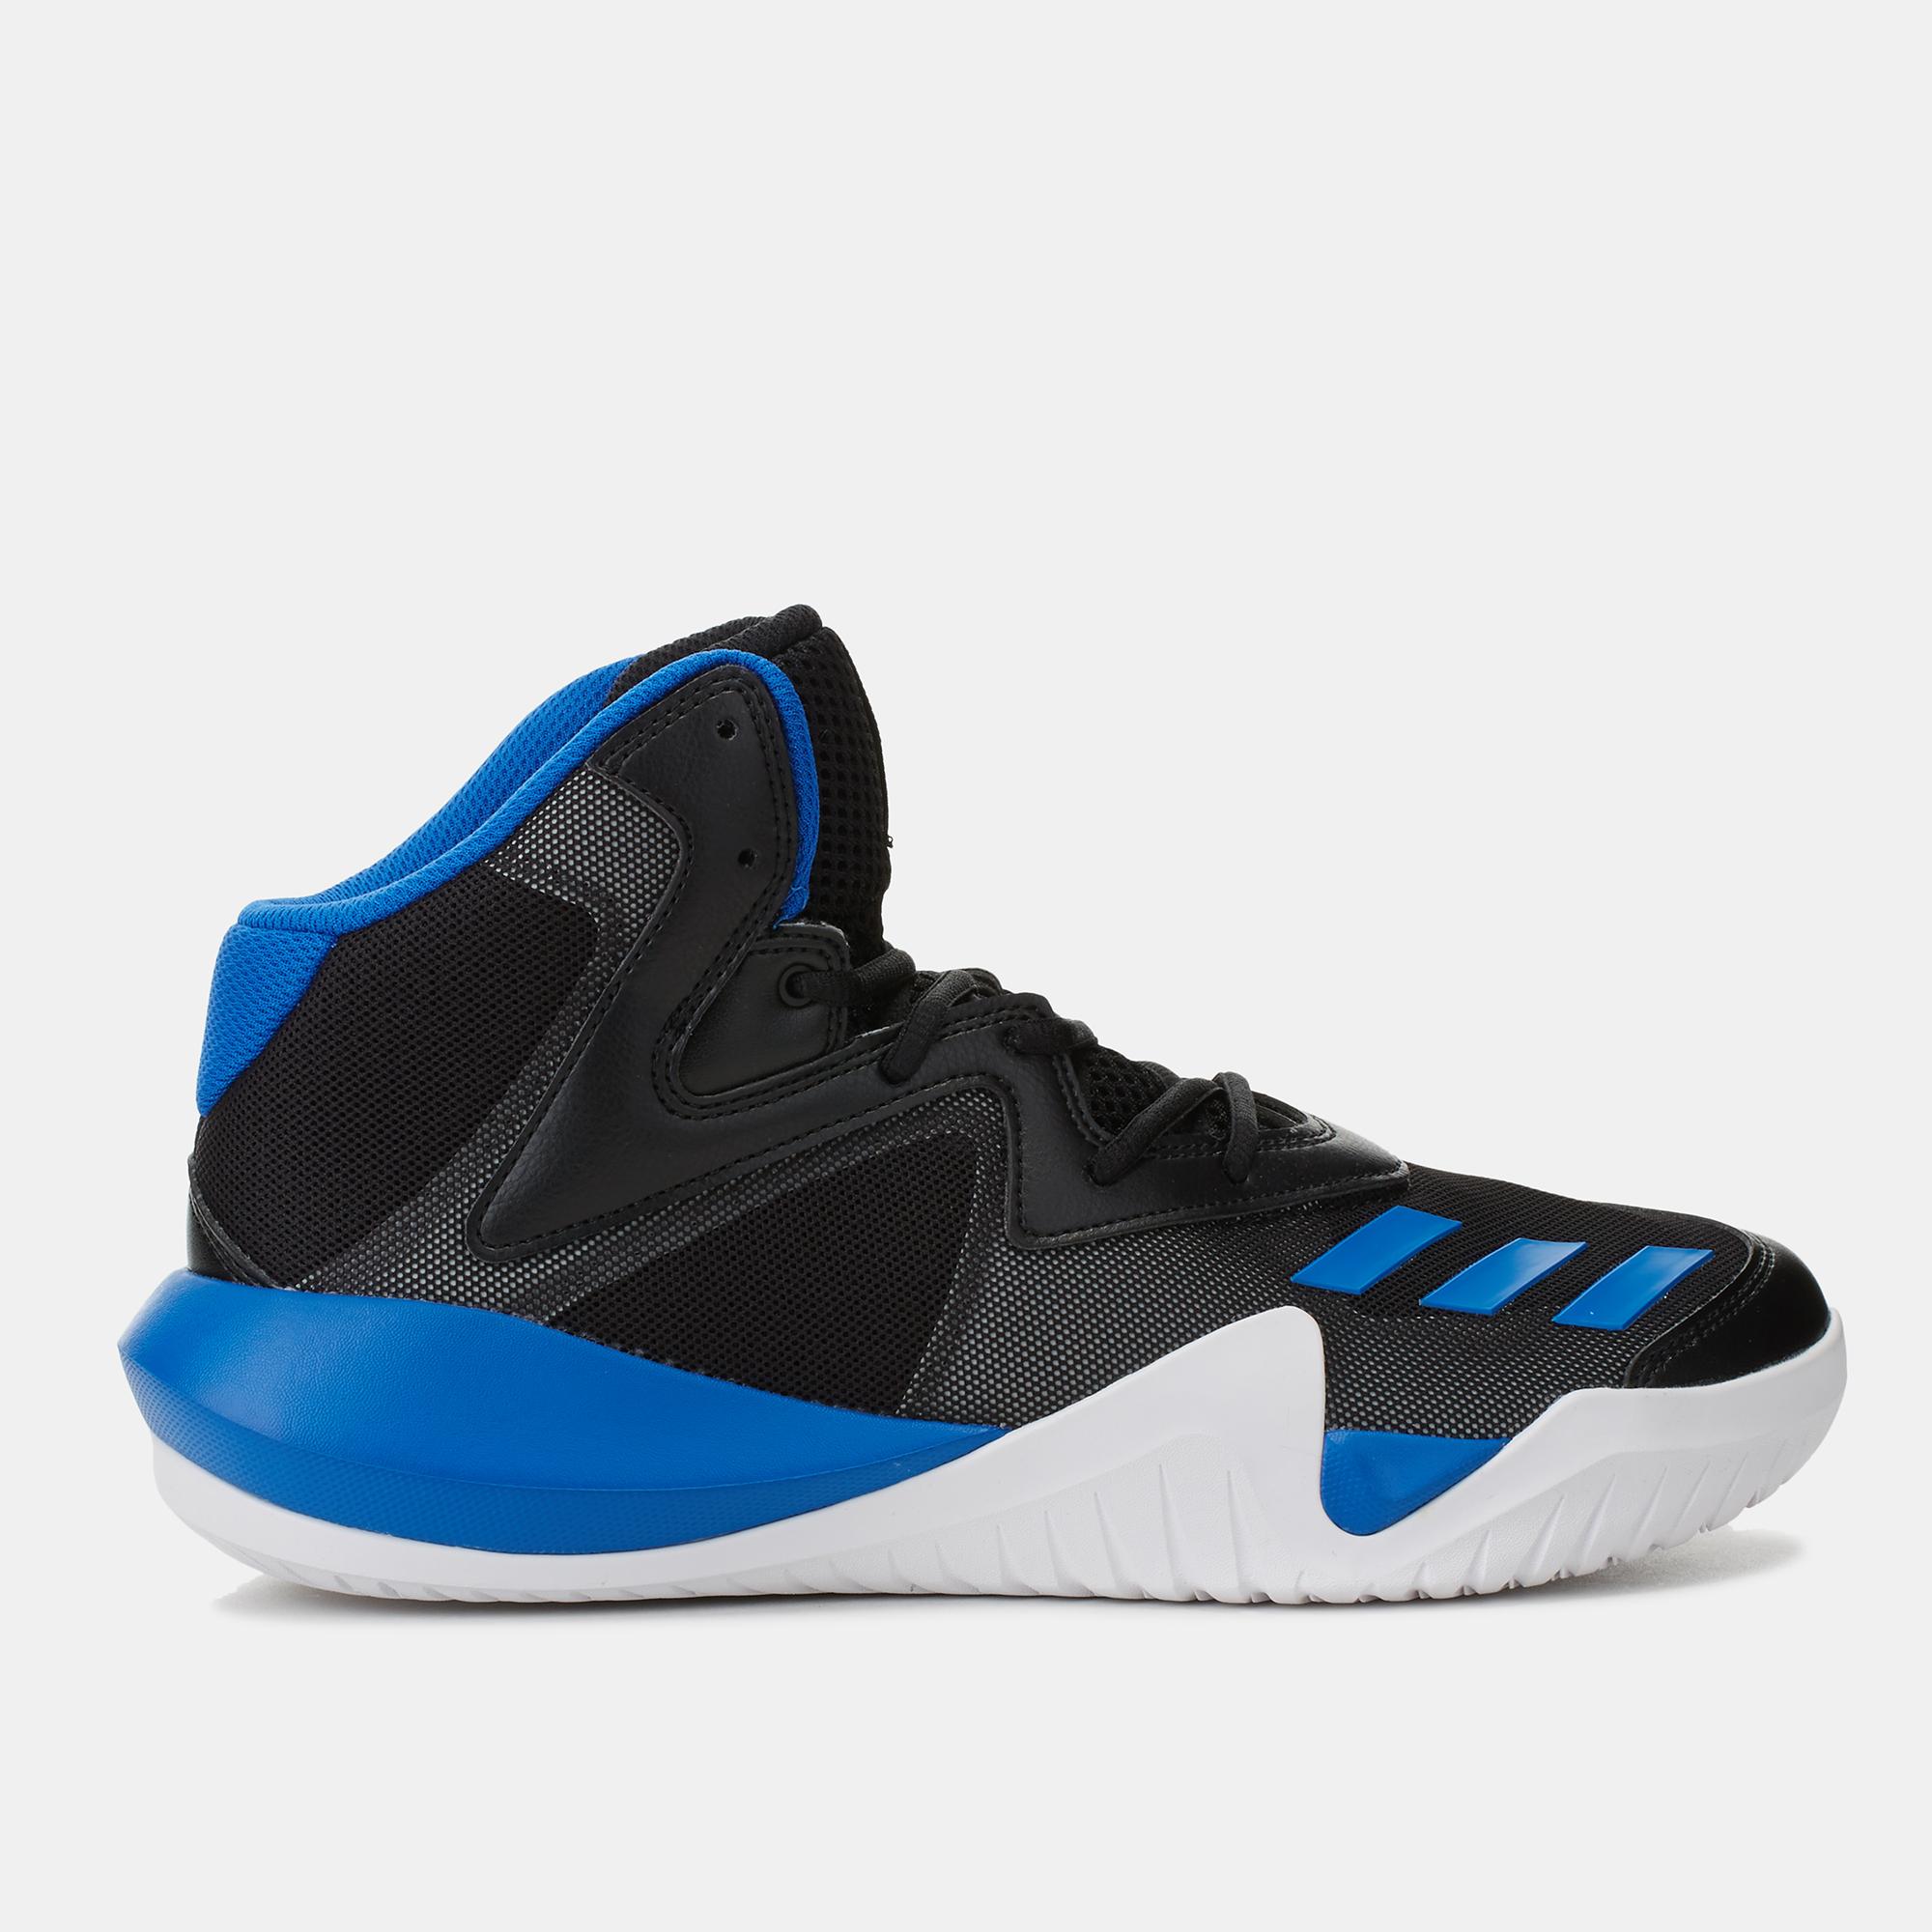 Zapatillas de baloncesto adidas baloncesto Crazy Team Team adidas 2017 | f9c6d8e - rspr.host